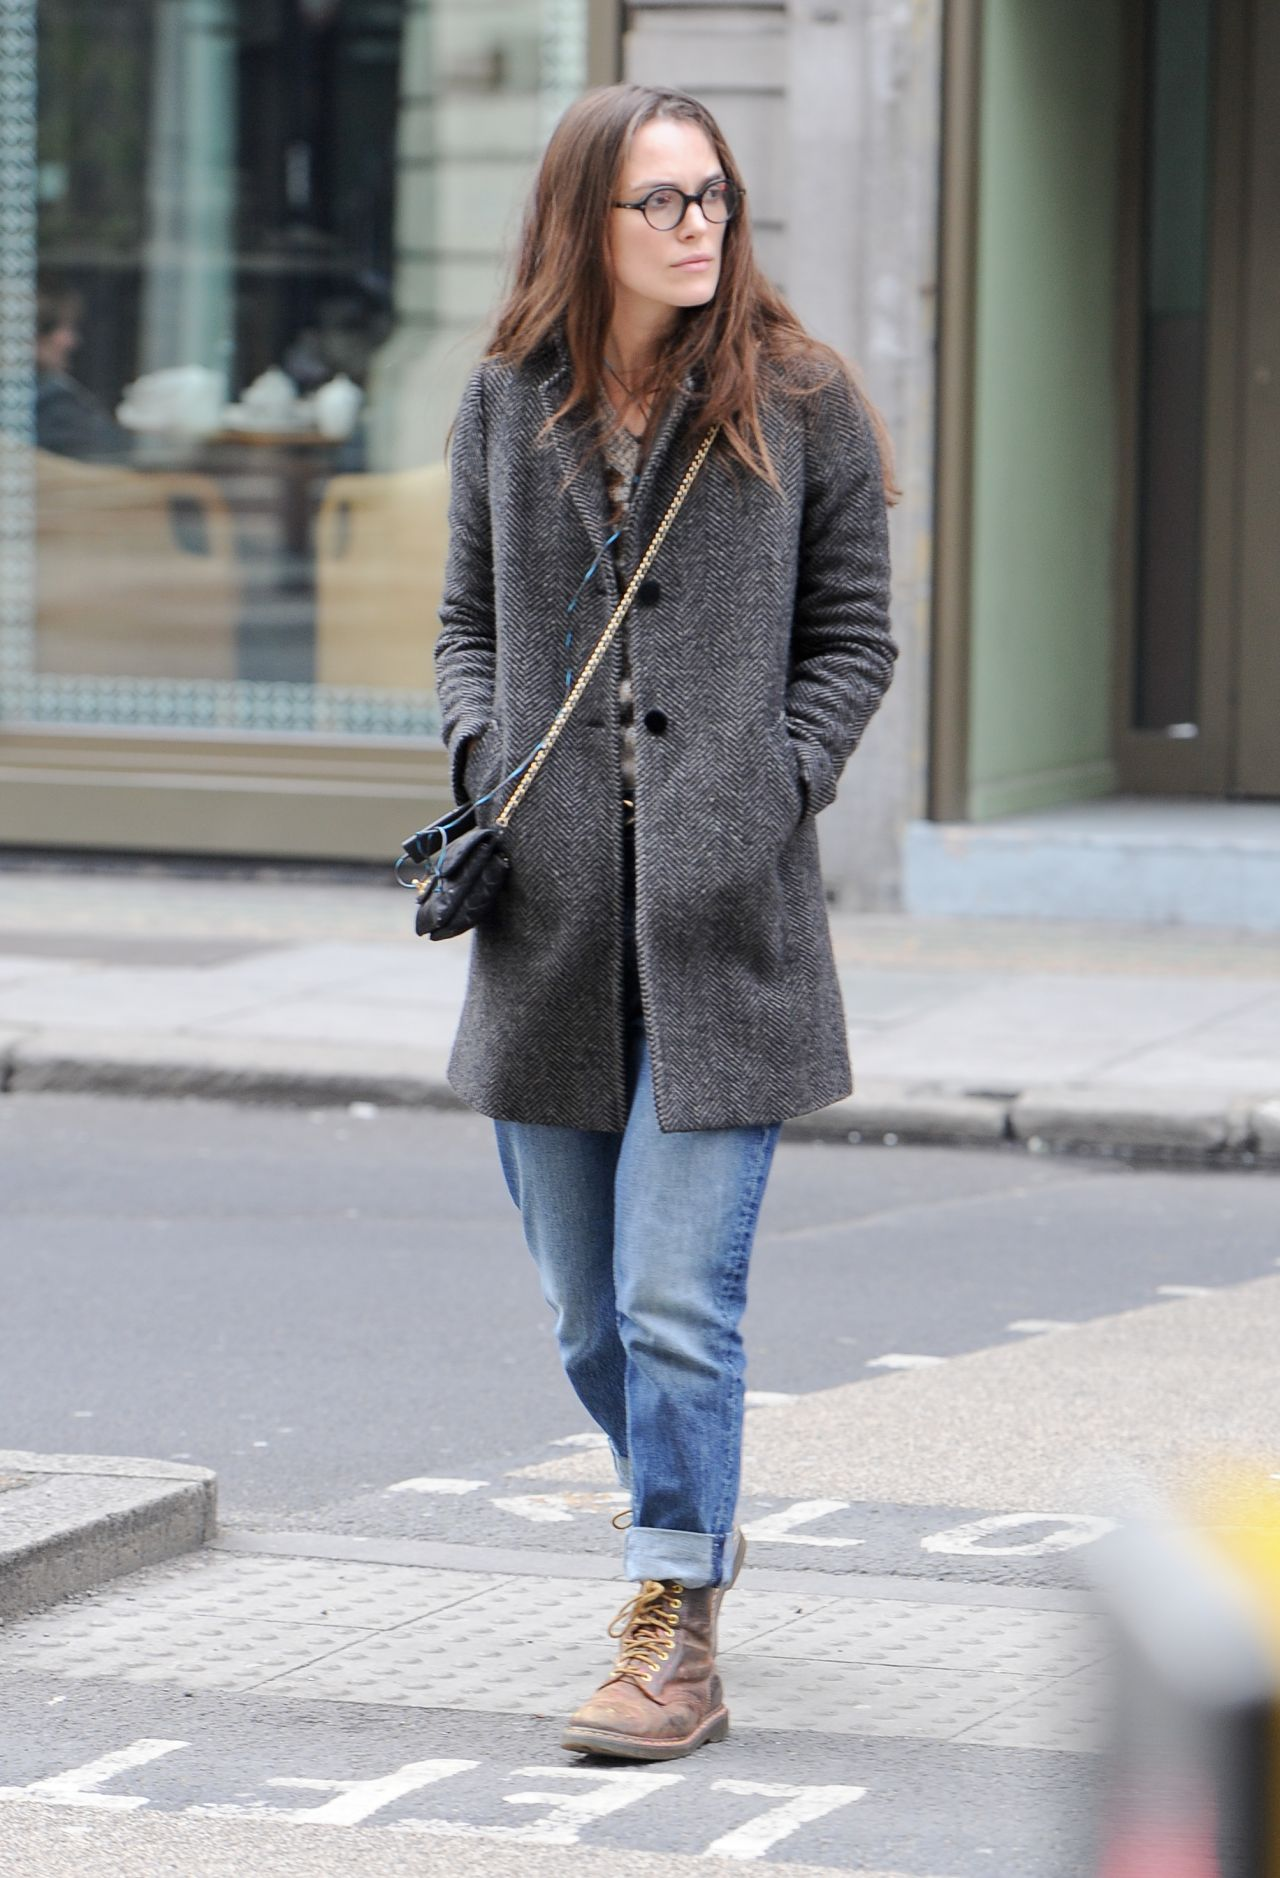 Keira Knightley Running Errands In Central London 323 2017